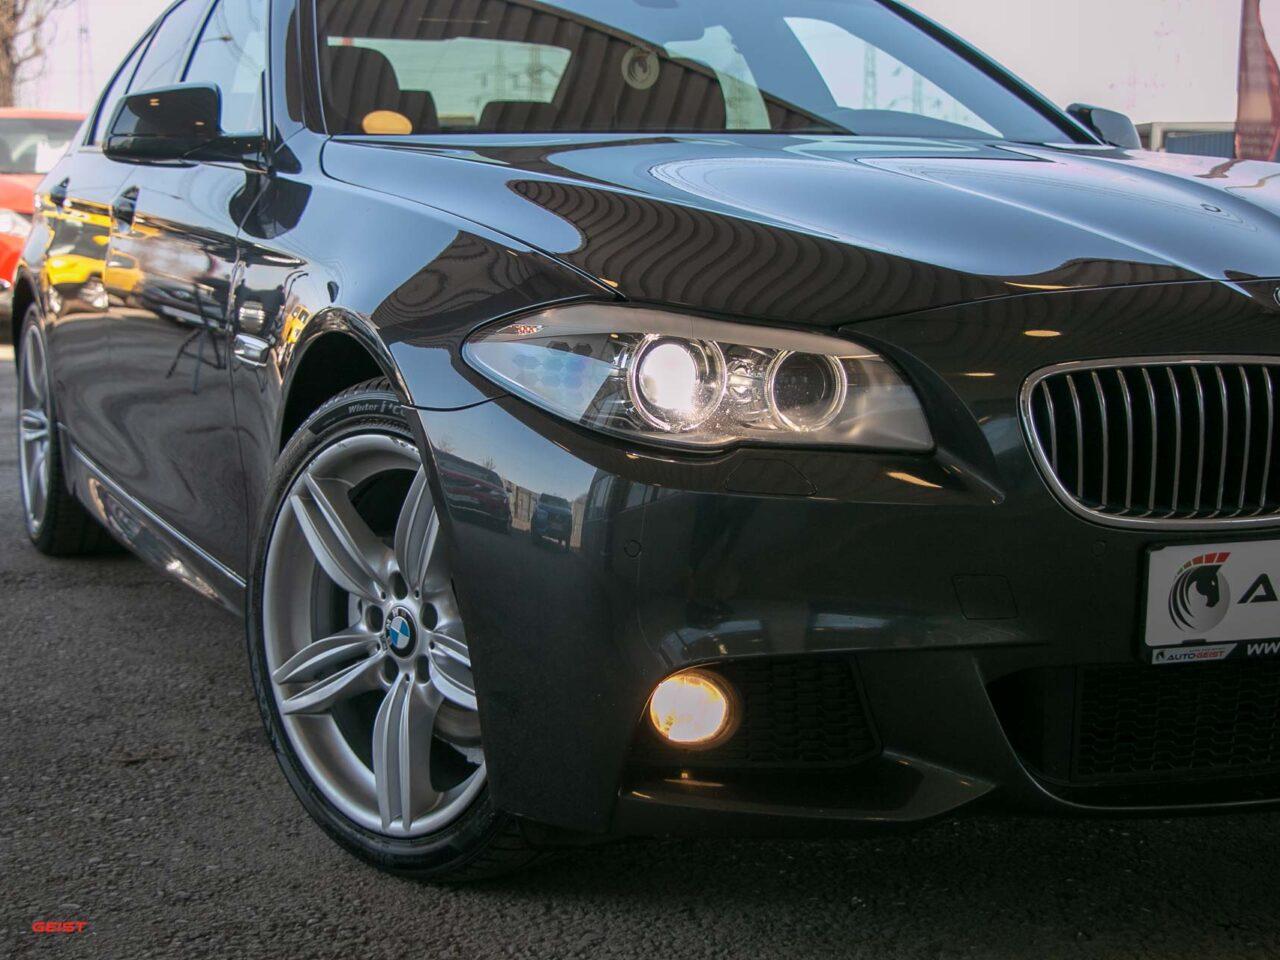 BMW-520D-seria5-automata-4494